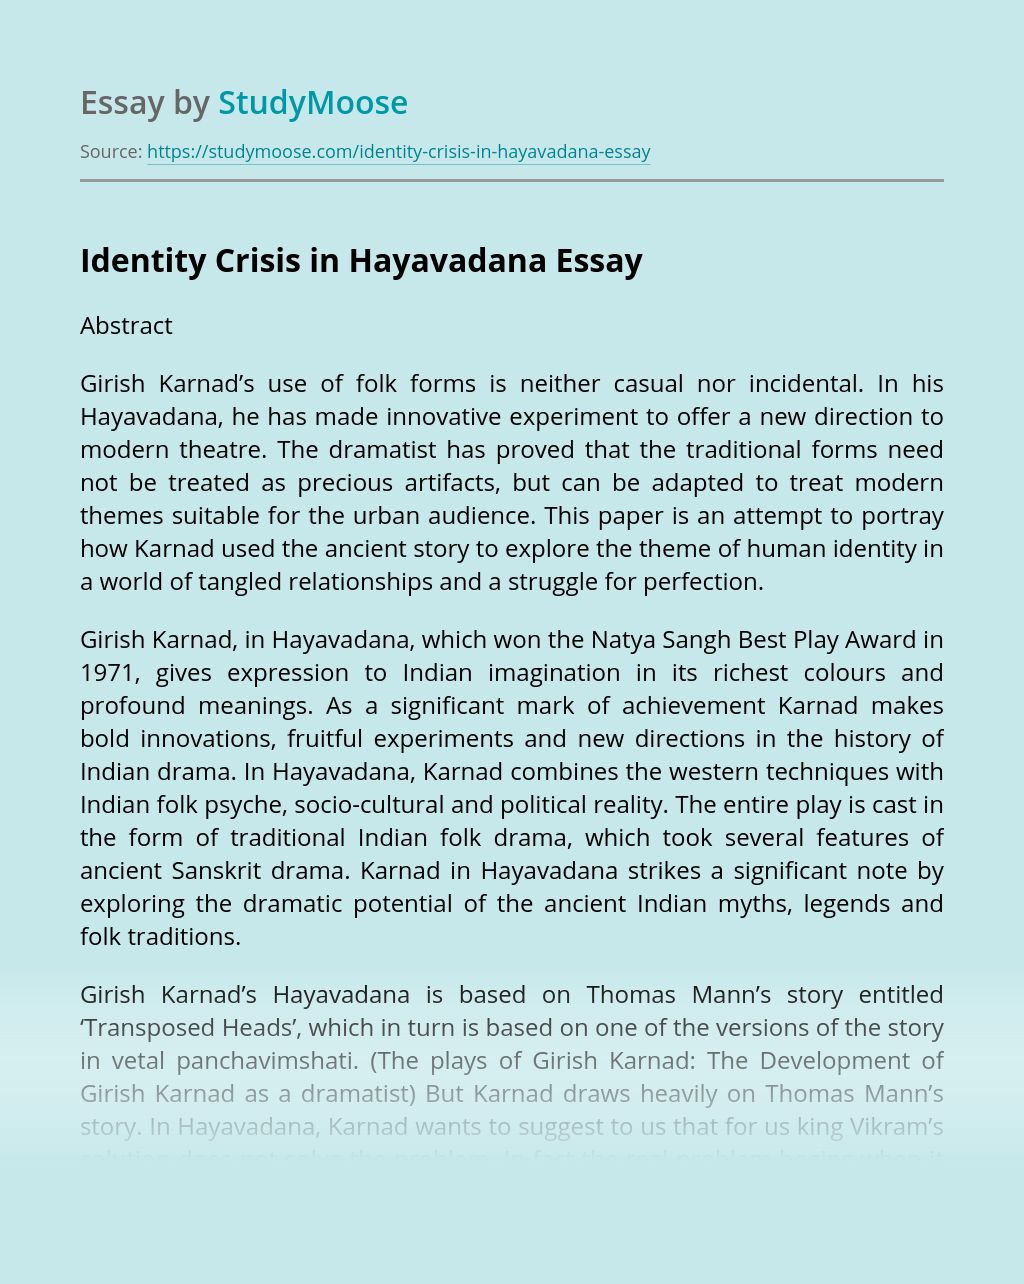 Identity Crisis in Hayavadana